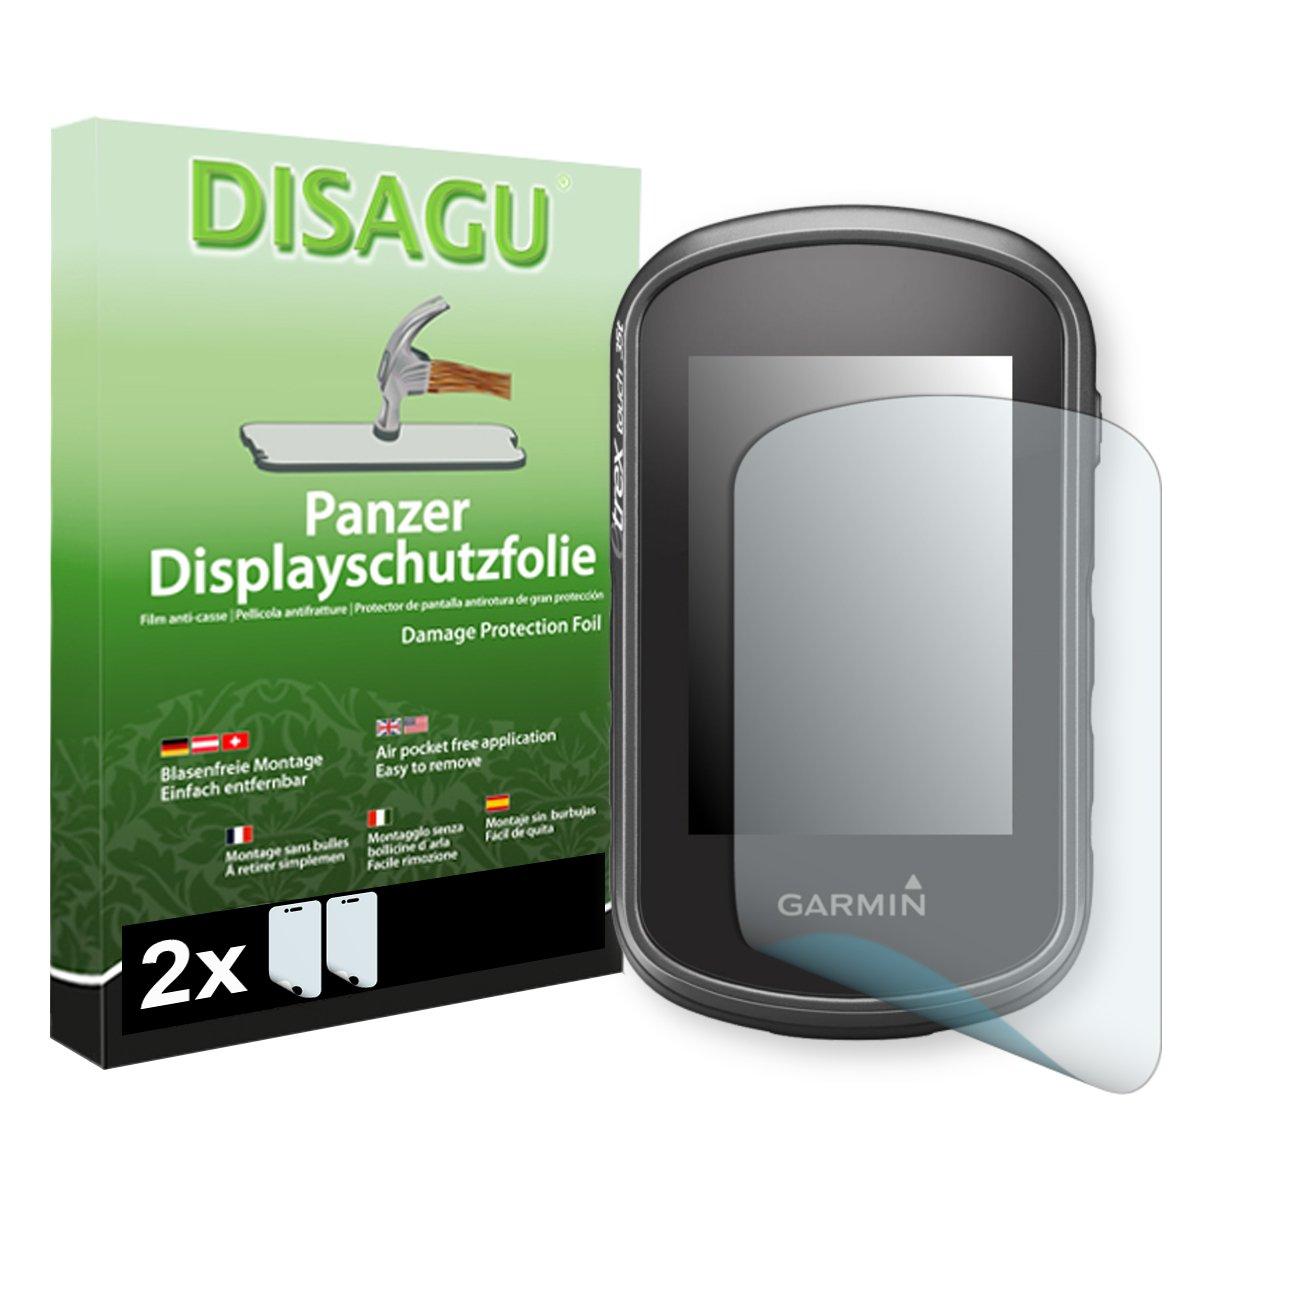 2 x DISAGU Armor screen protector for Garmin eTrex Touch 35 screen fracture protection film #dp6579_2